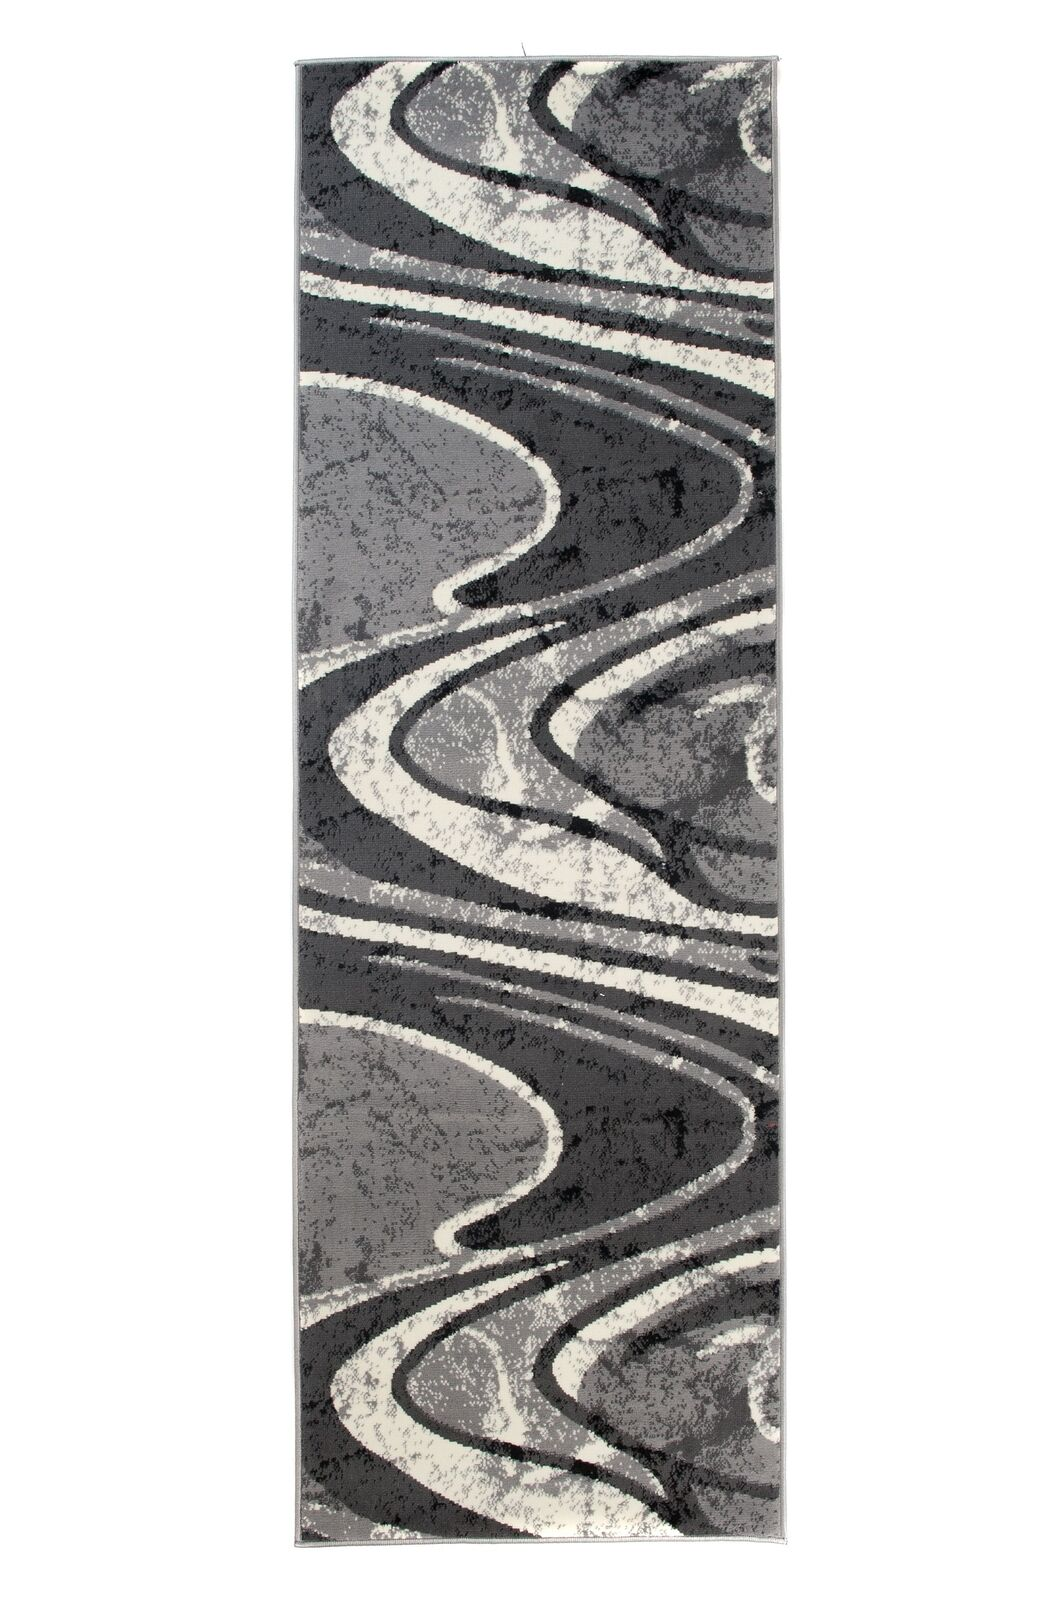 Läufer Teppich Grau Küche Flur Flur Flur Kurzflor Modern 70x200 80x200 100x300 + | Qualitätsprodukte  1101e3